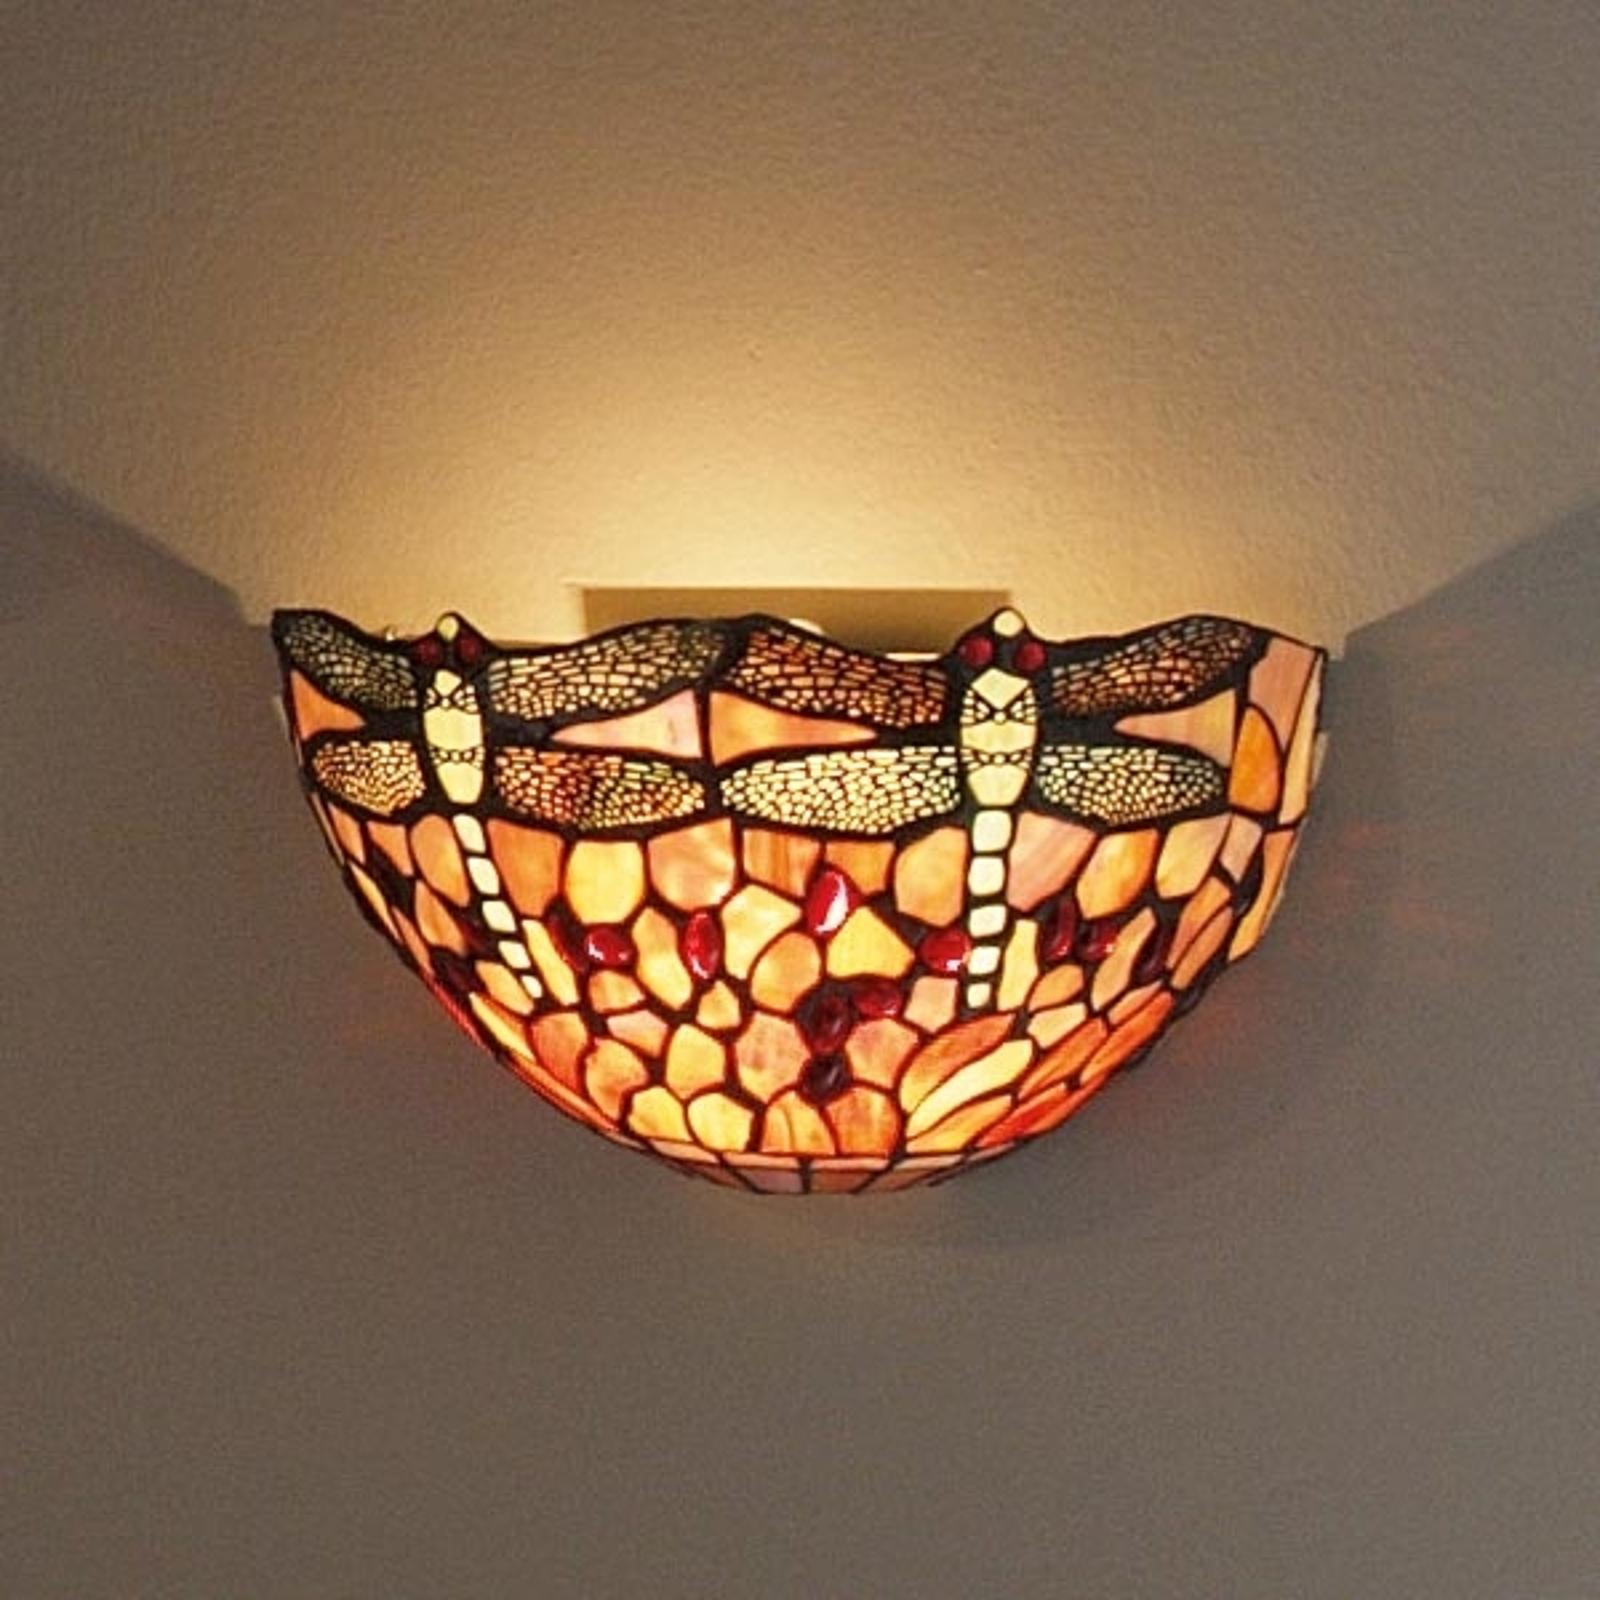 LIVELLA væglampe i Tiffany-stil